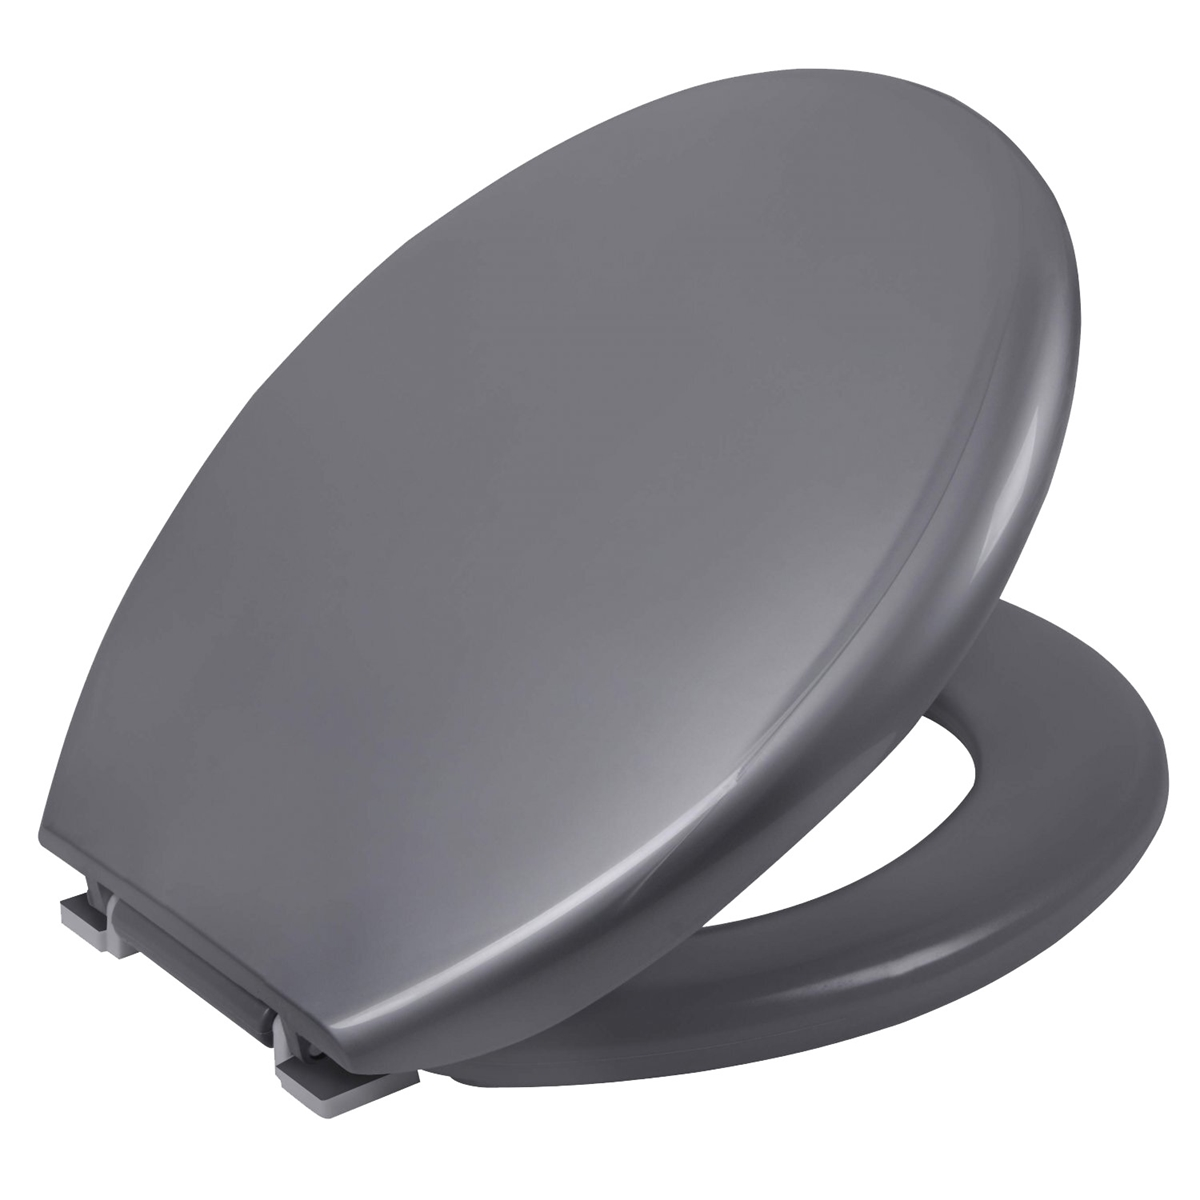 Assento Sanitario Astra Oval Almofadado TPK/AS - Metalizado Prata (PRA)